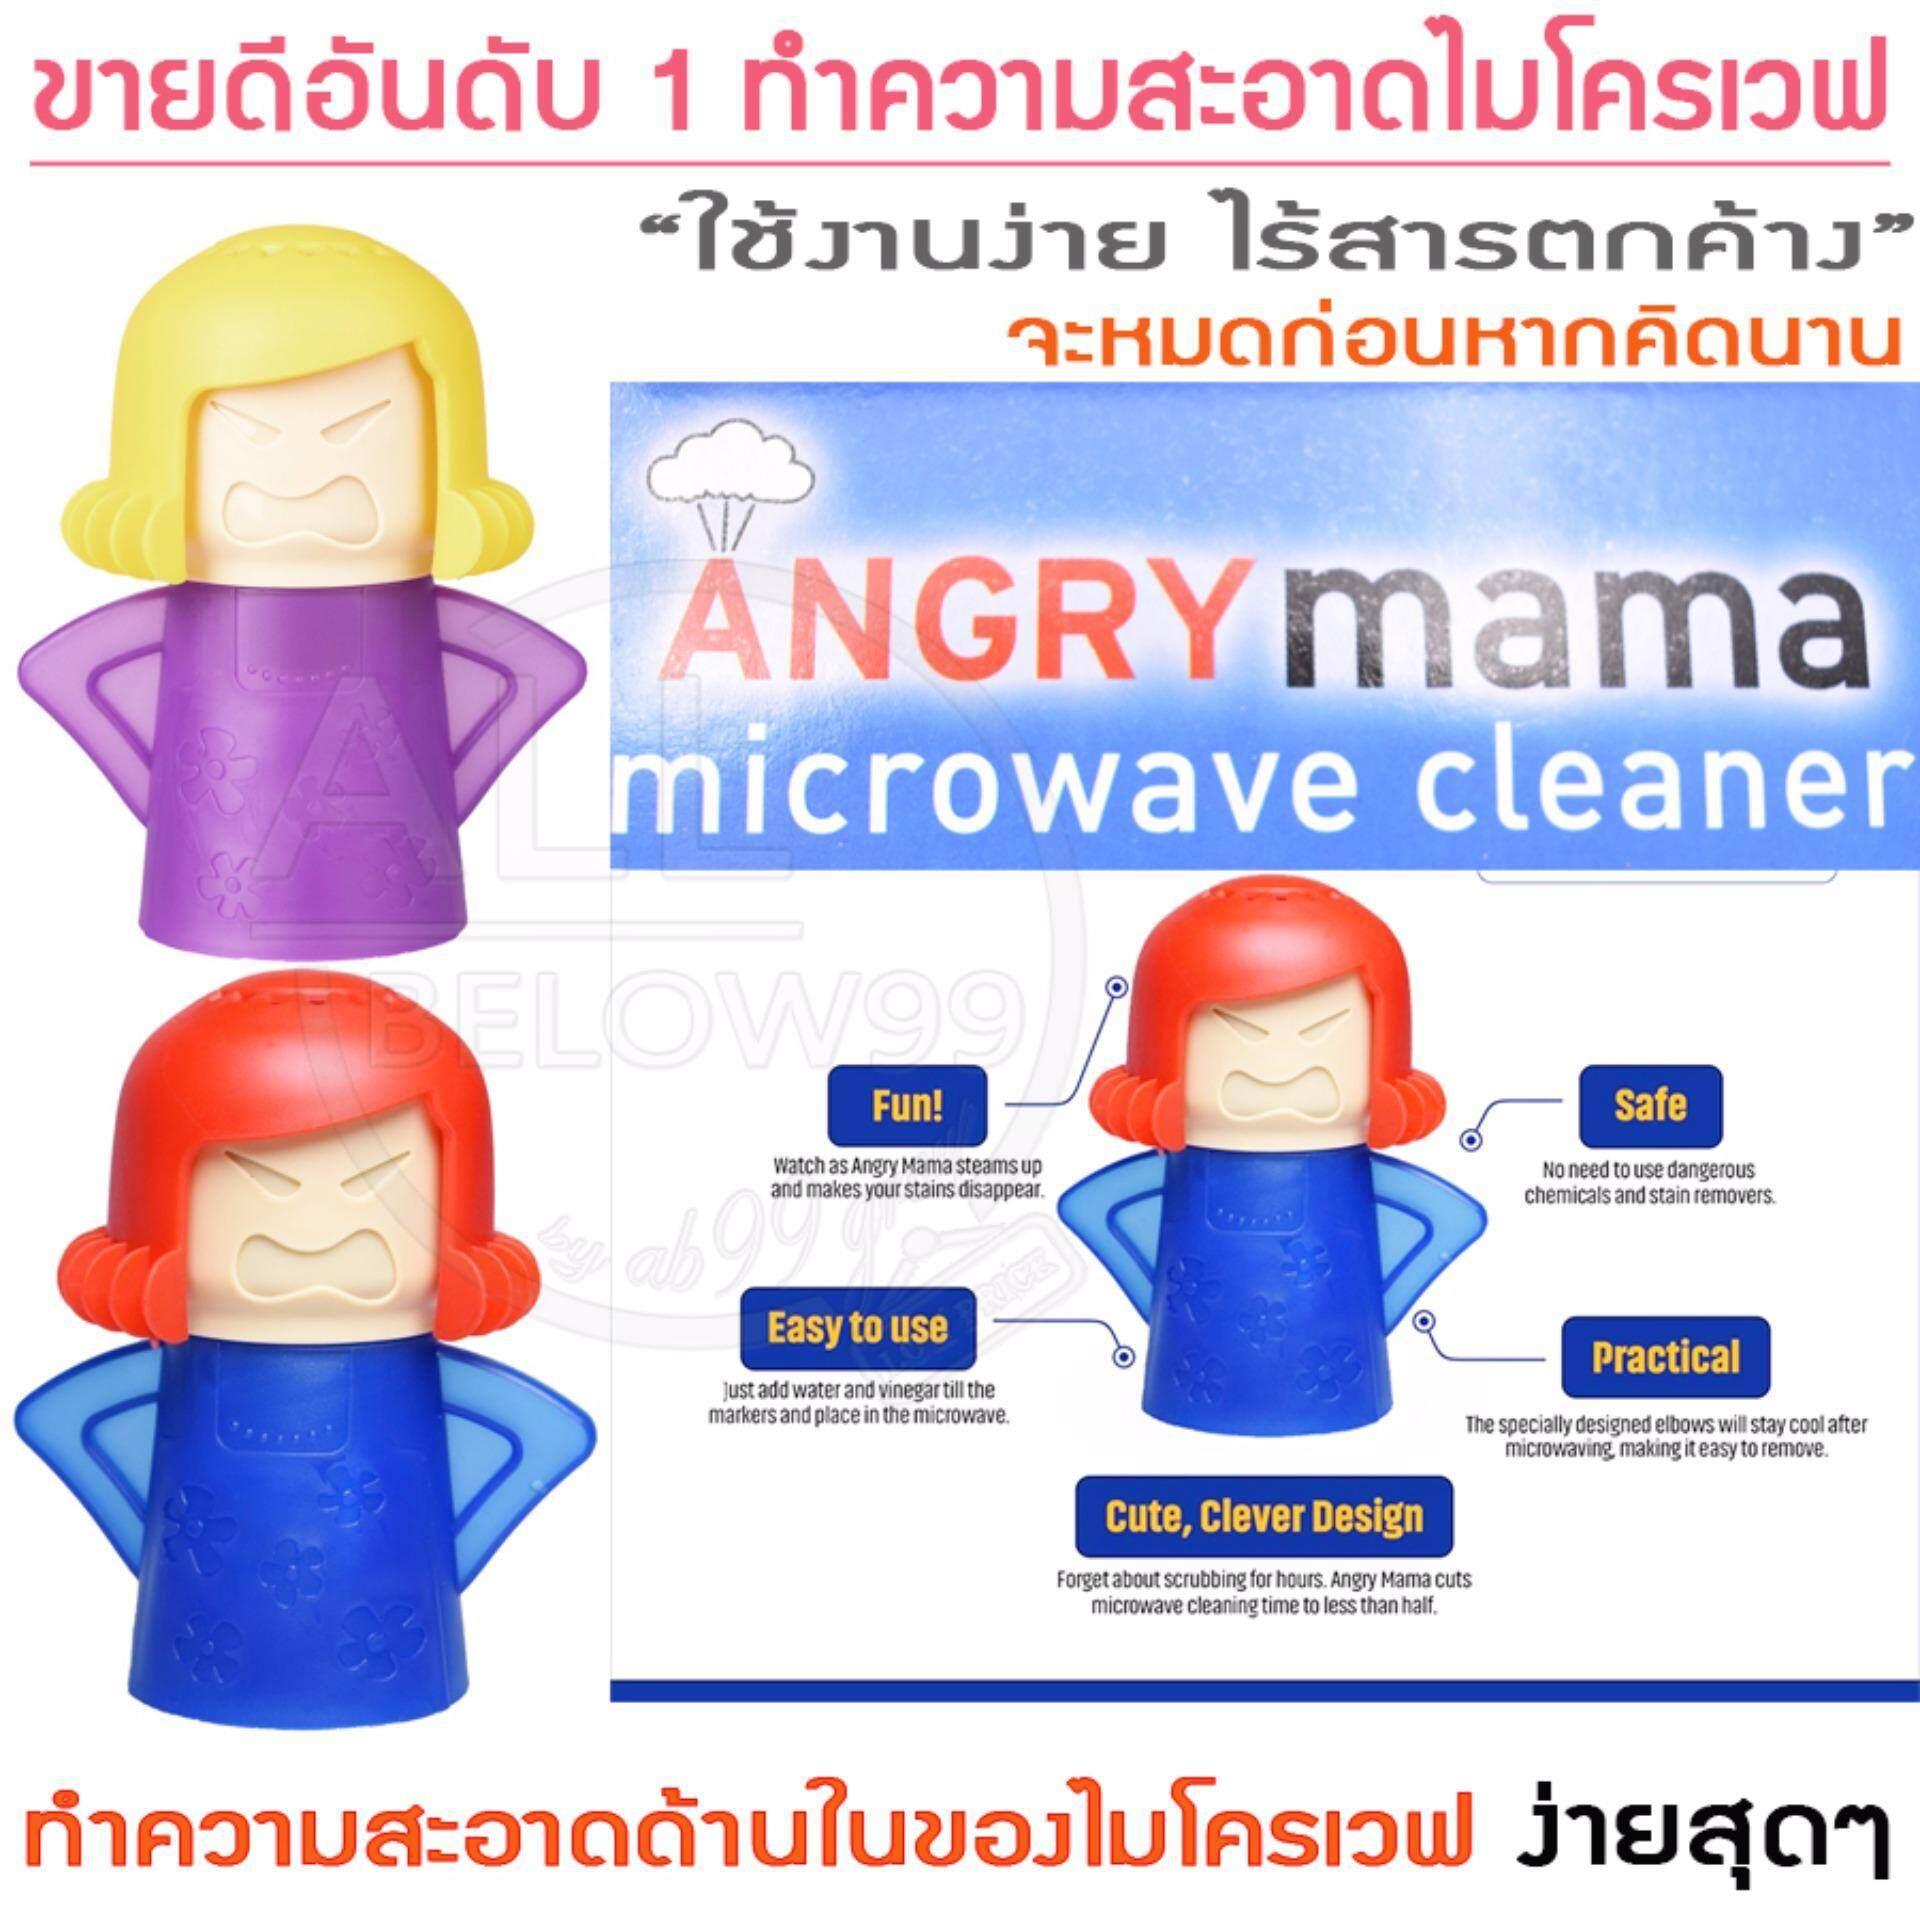 Angry Mama ตุ๊กตาทำความสะอาดเตาไมโครเวฟ By Remembershop.